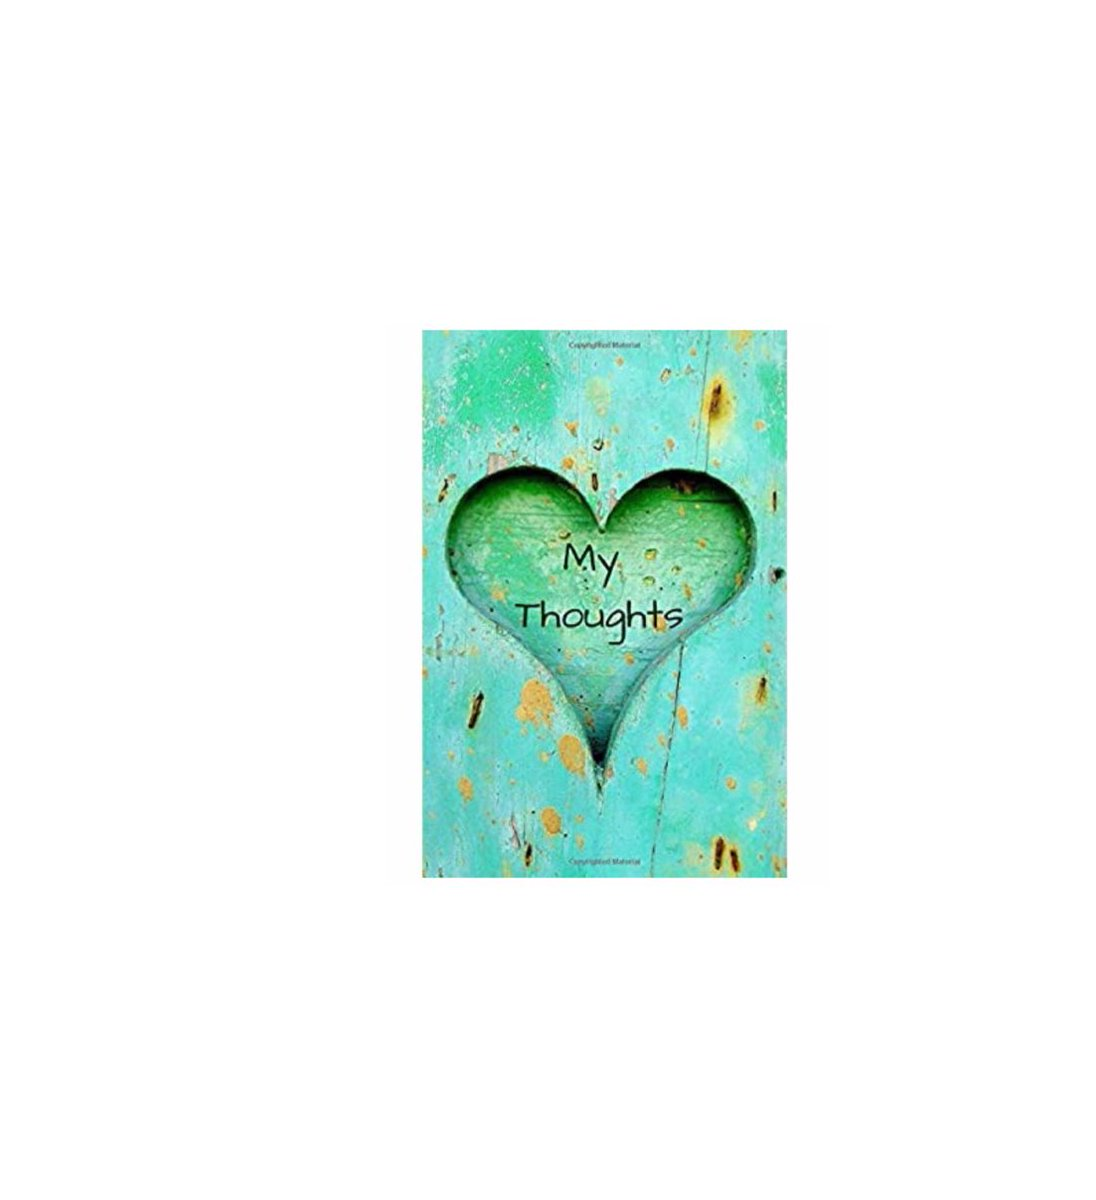 MY THOUGHTS 💚  via @amazon  💚#quotes #journal #lifestory #mythoughts #mylife #COVID #QuarantineAndChill #diaries #FindYourself #QuarantineActivities #thisisforme #writerscommunity #lockdown #FlattenTheCuve #stayhome #coronavirus #activities #activitybooks